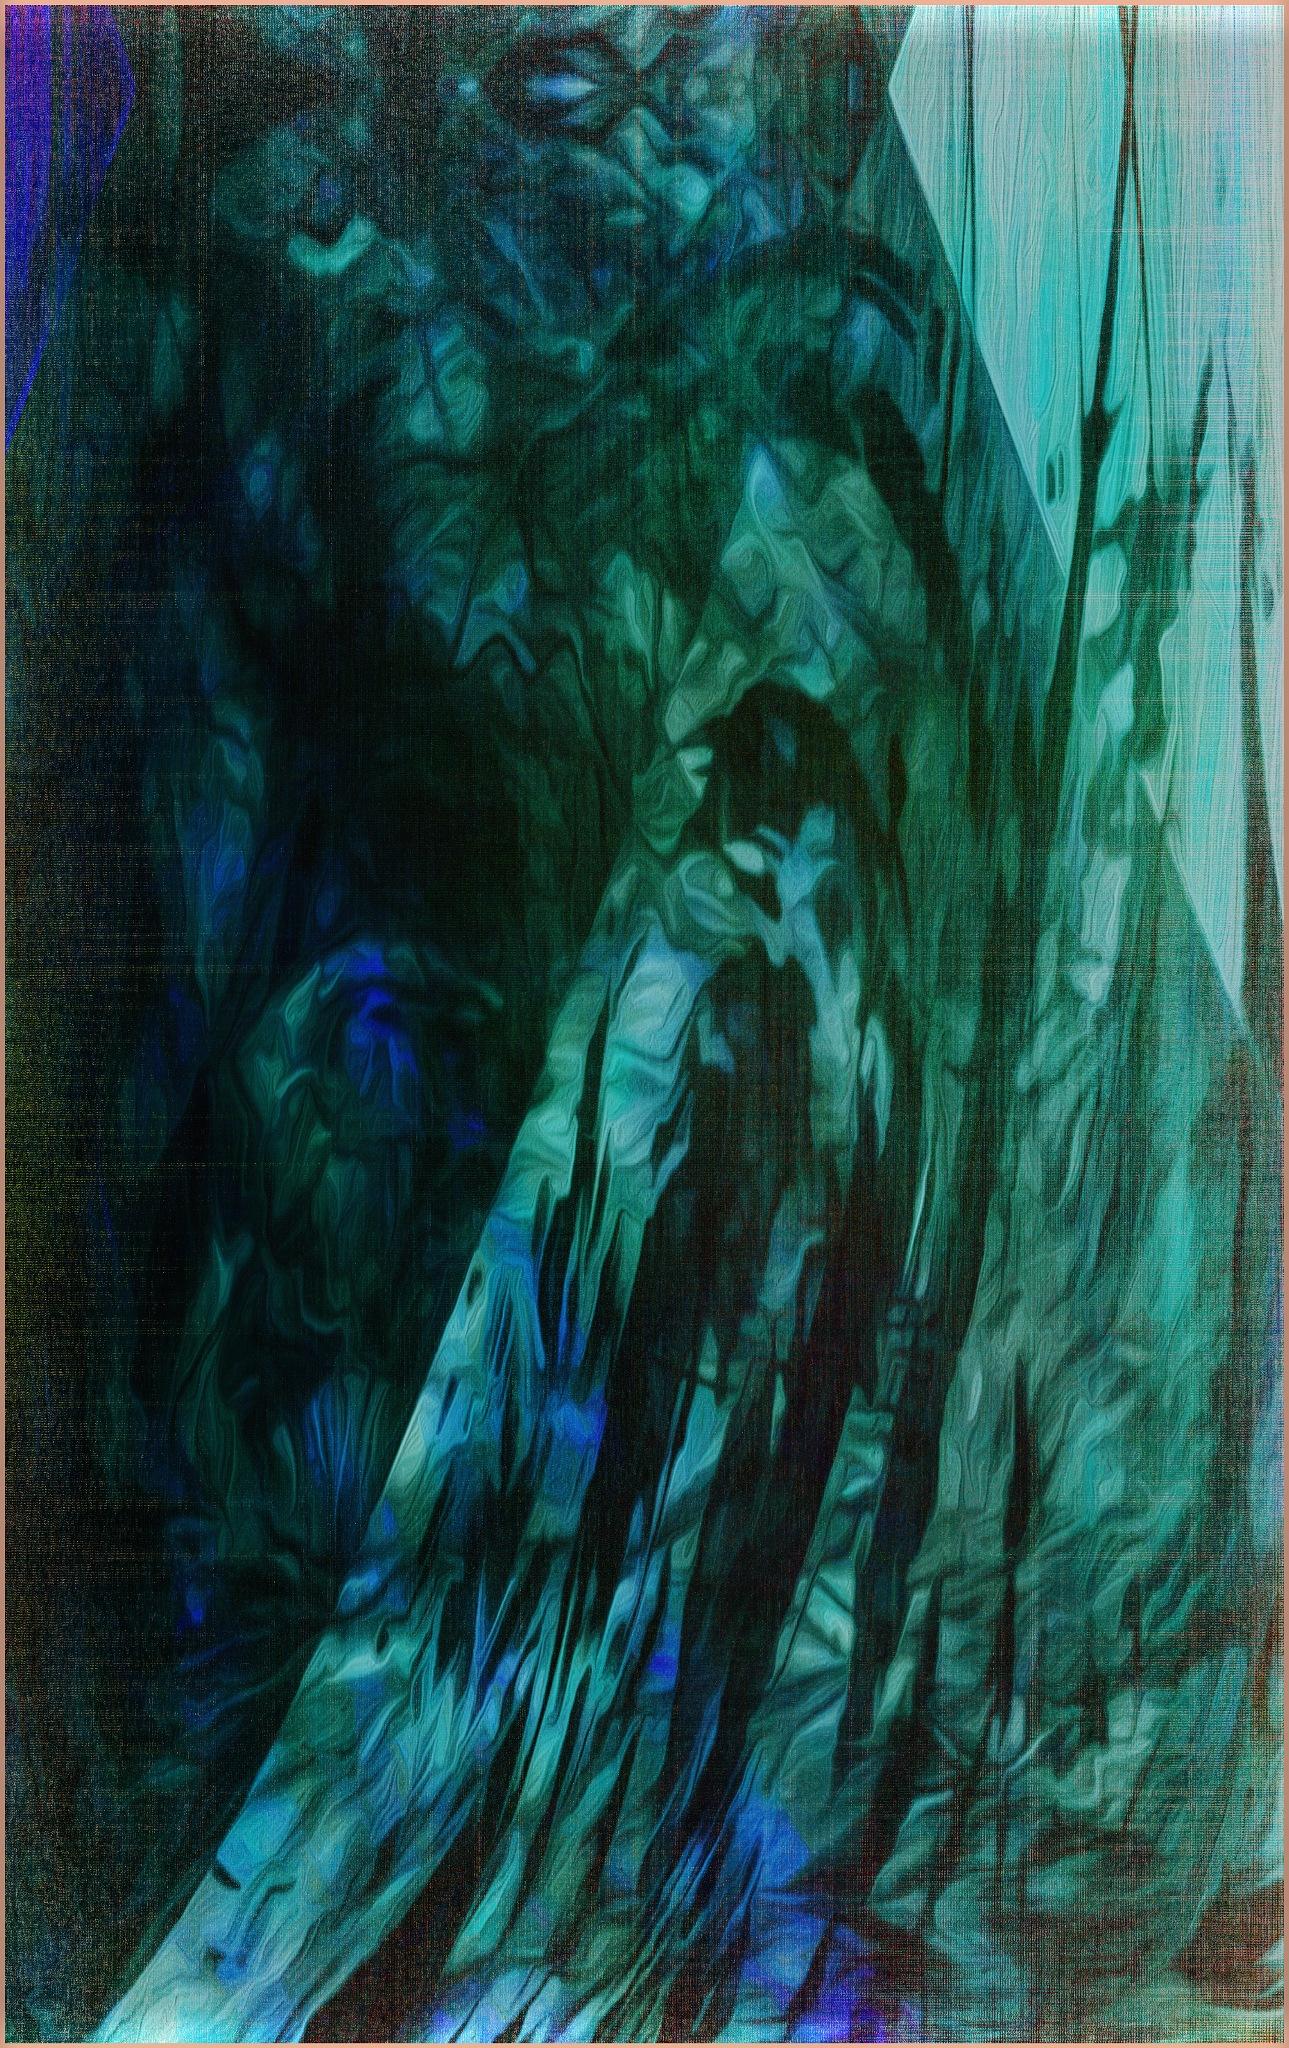 Demons by Mikael Rennerhorn